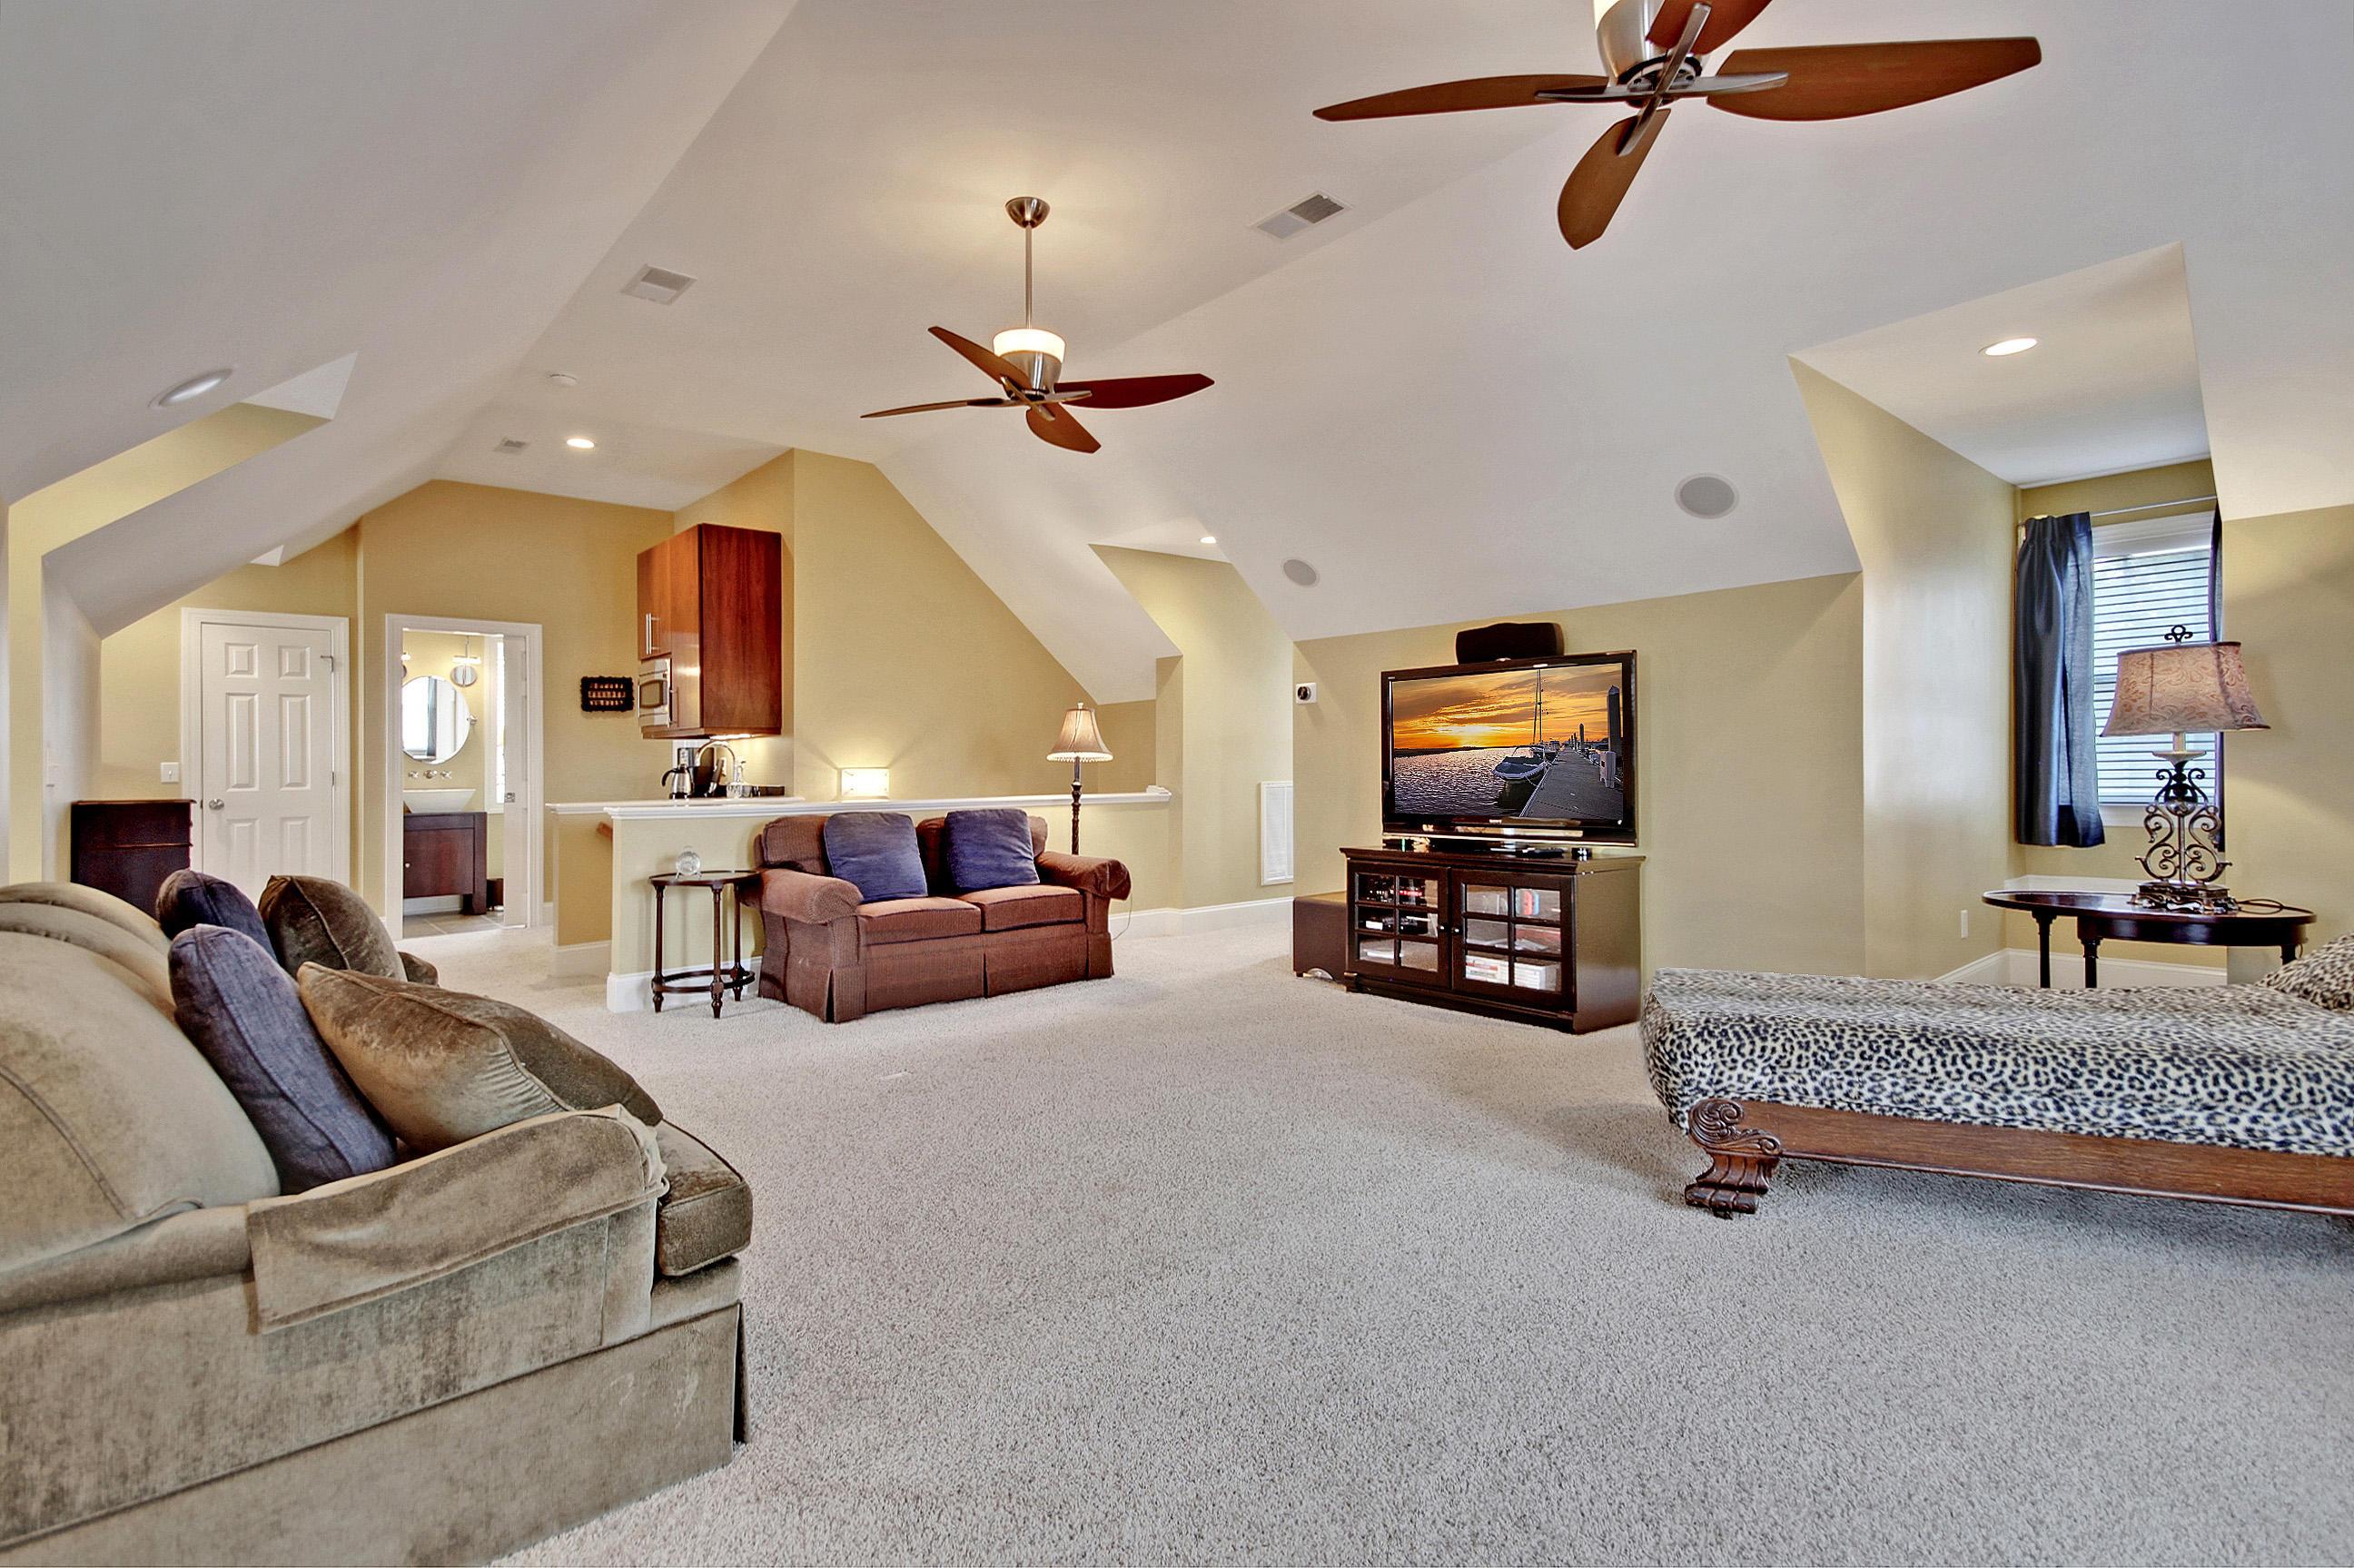 Dunes West Homes For Sale - 2364 Darts Cove, Mount Pleasant, SC - 11